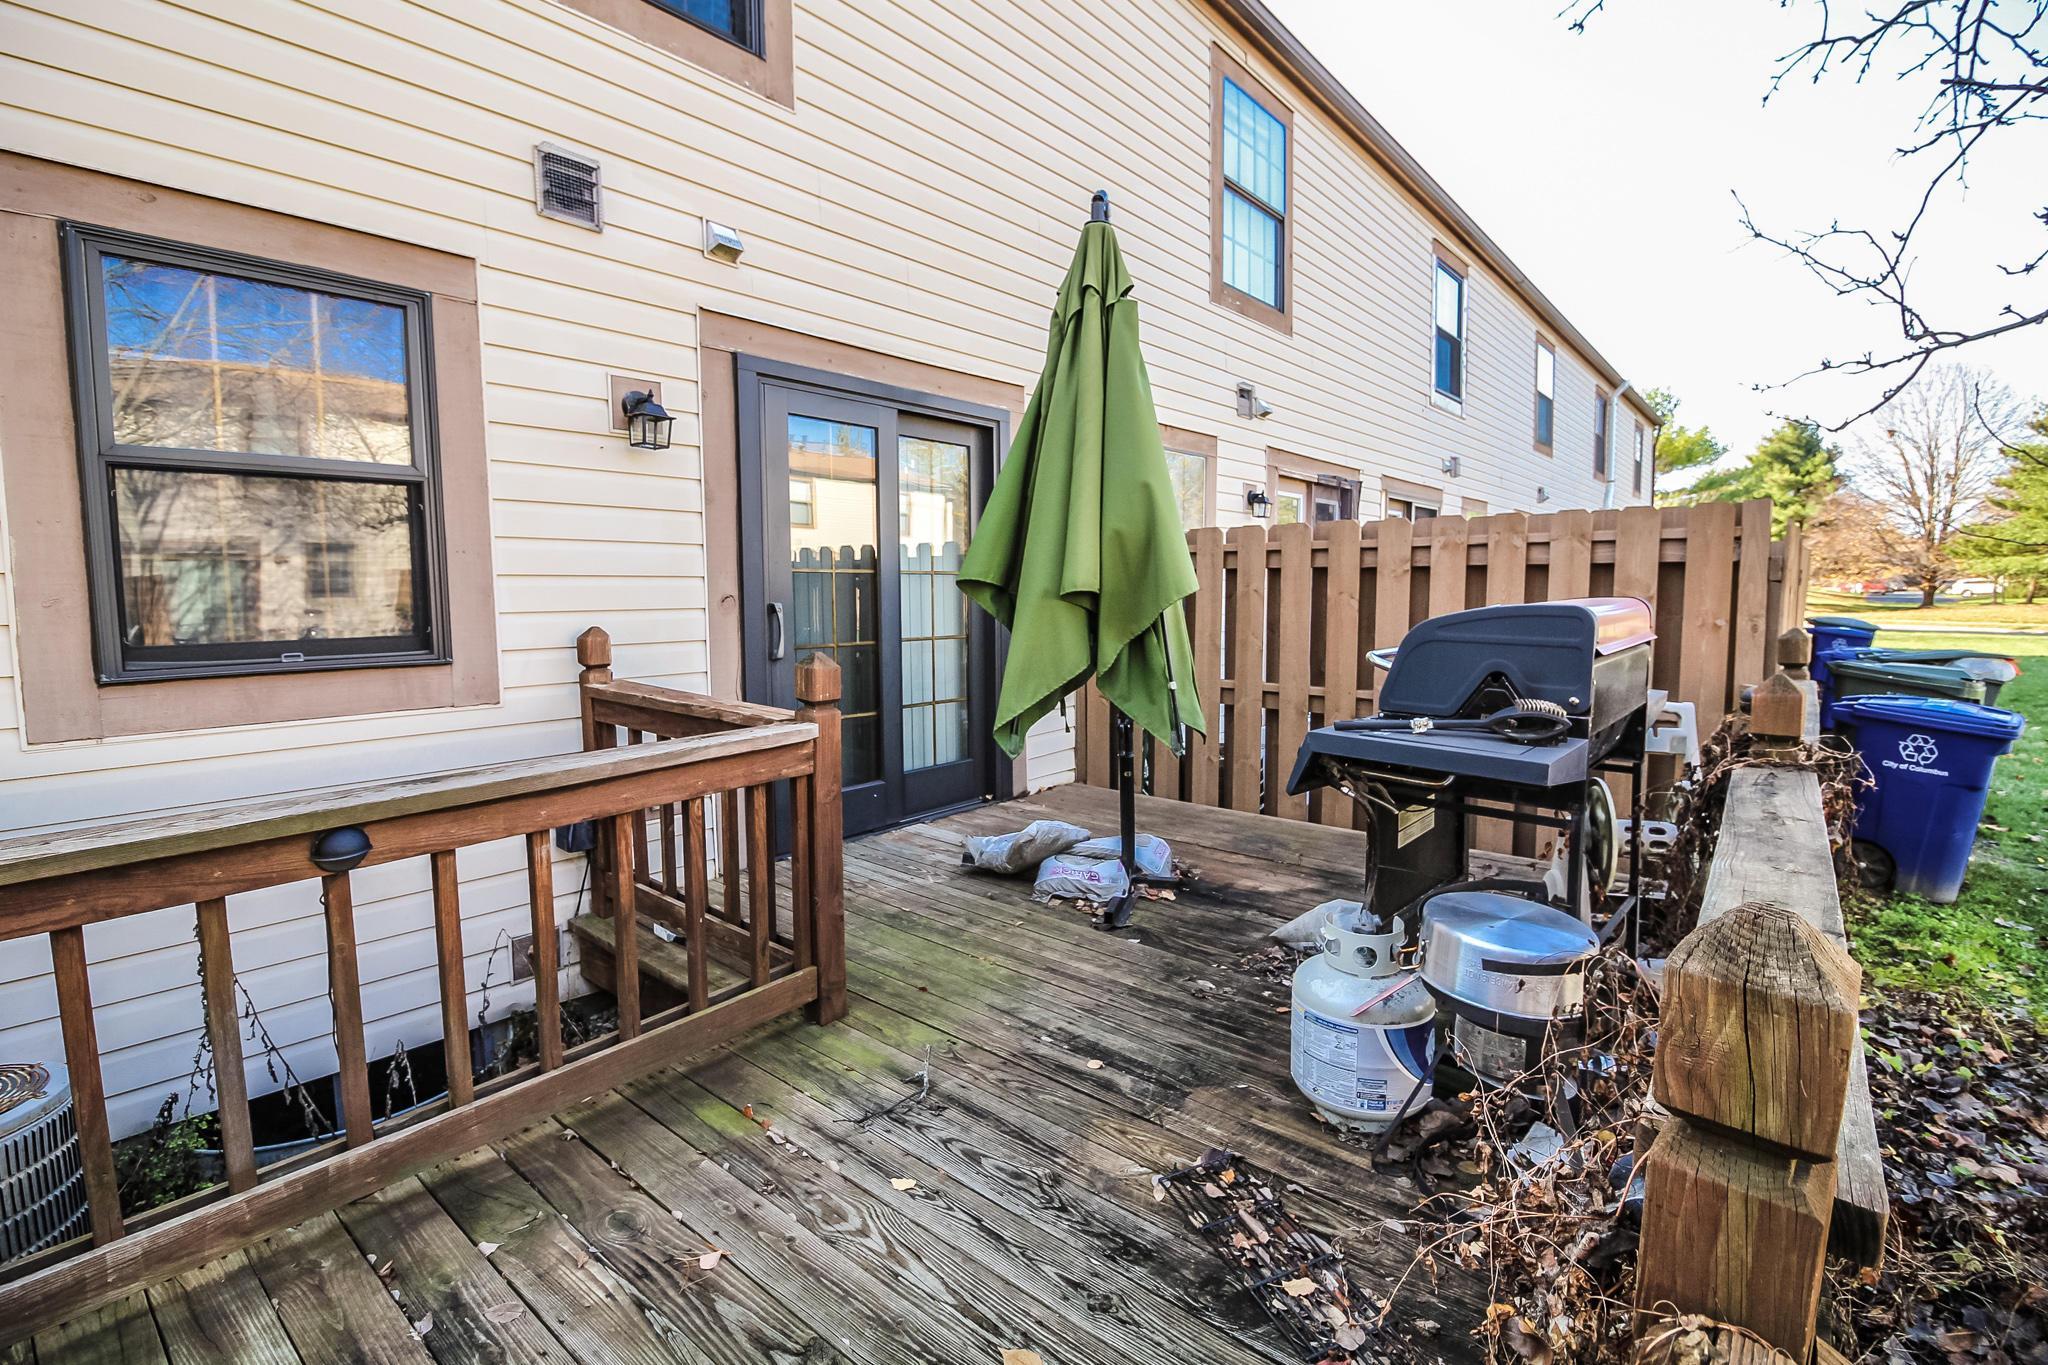 696 Keys View Court, Worthington, Ohio 43085, 3 Bedrooms Bedrooms, ,2 BathroomsBathrooms,Residential,For Sale,Keys View,220040546